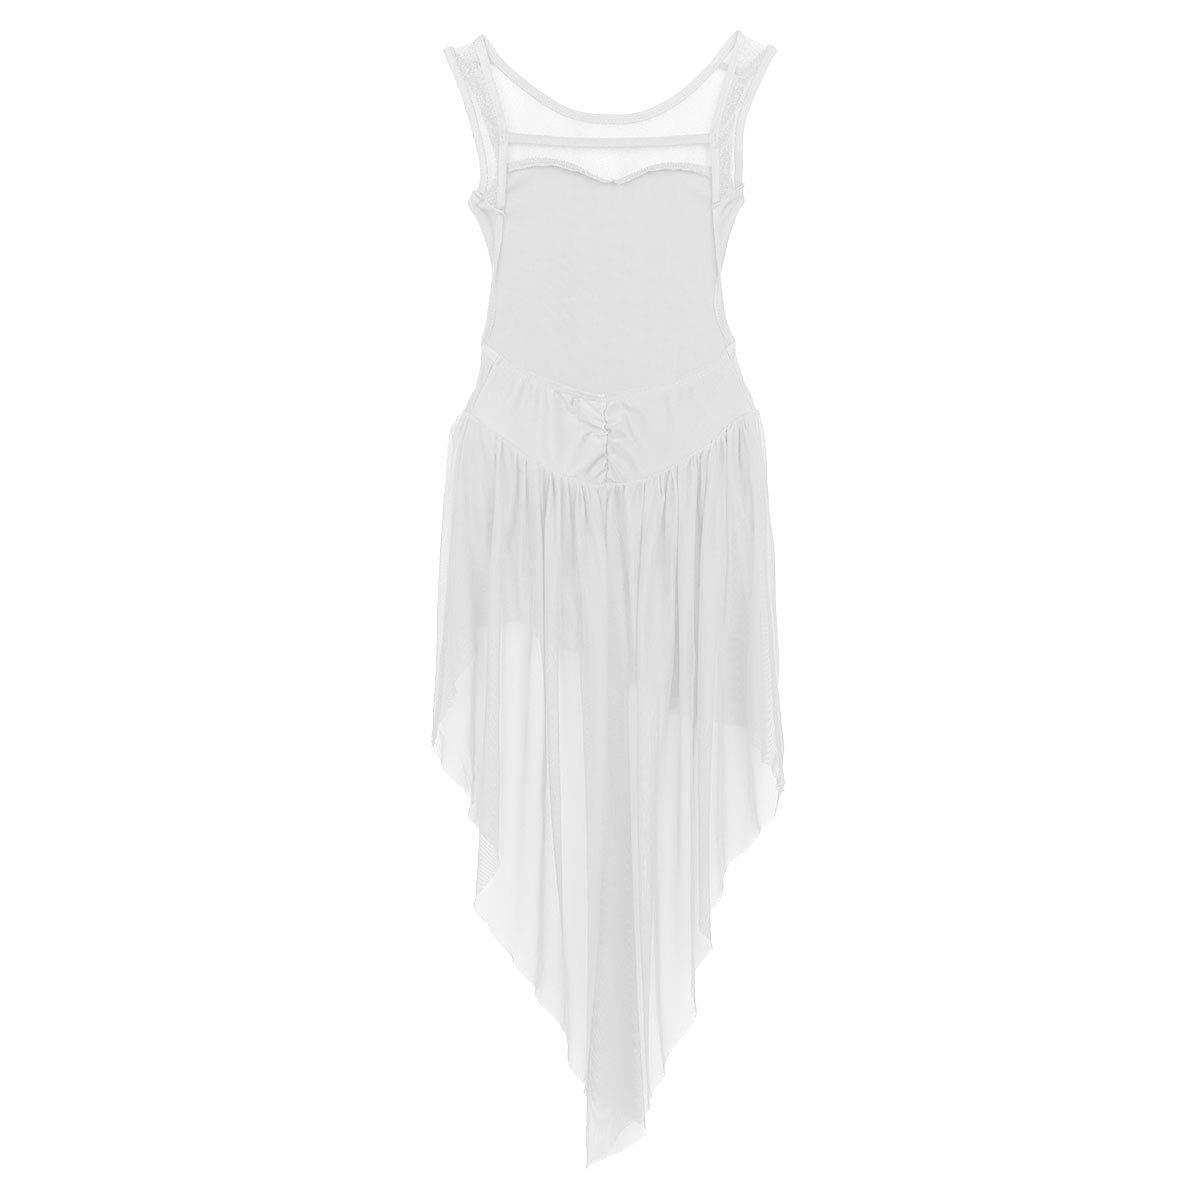 4a975ba5f2f8c CHICTRY Robe Danse Latine Fille Robe Danseuse Robe Danse de Salon Rumba  Zumba Salsa Robe de Ballet Robe Danse contemporaine Enfant 4-14 Ans   Amazon.fr  ...